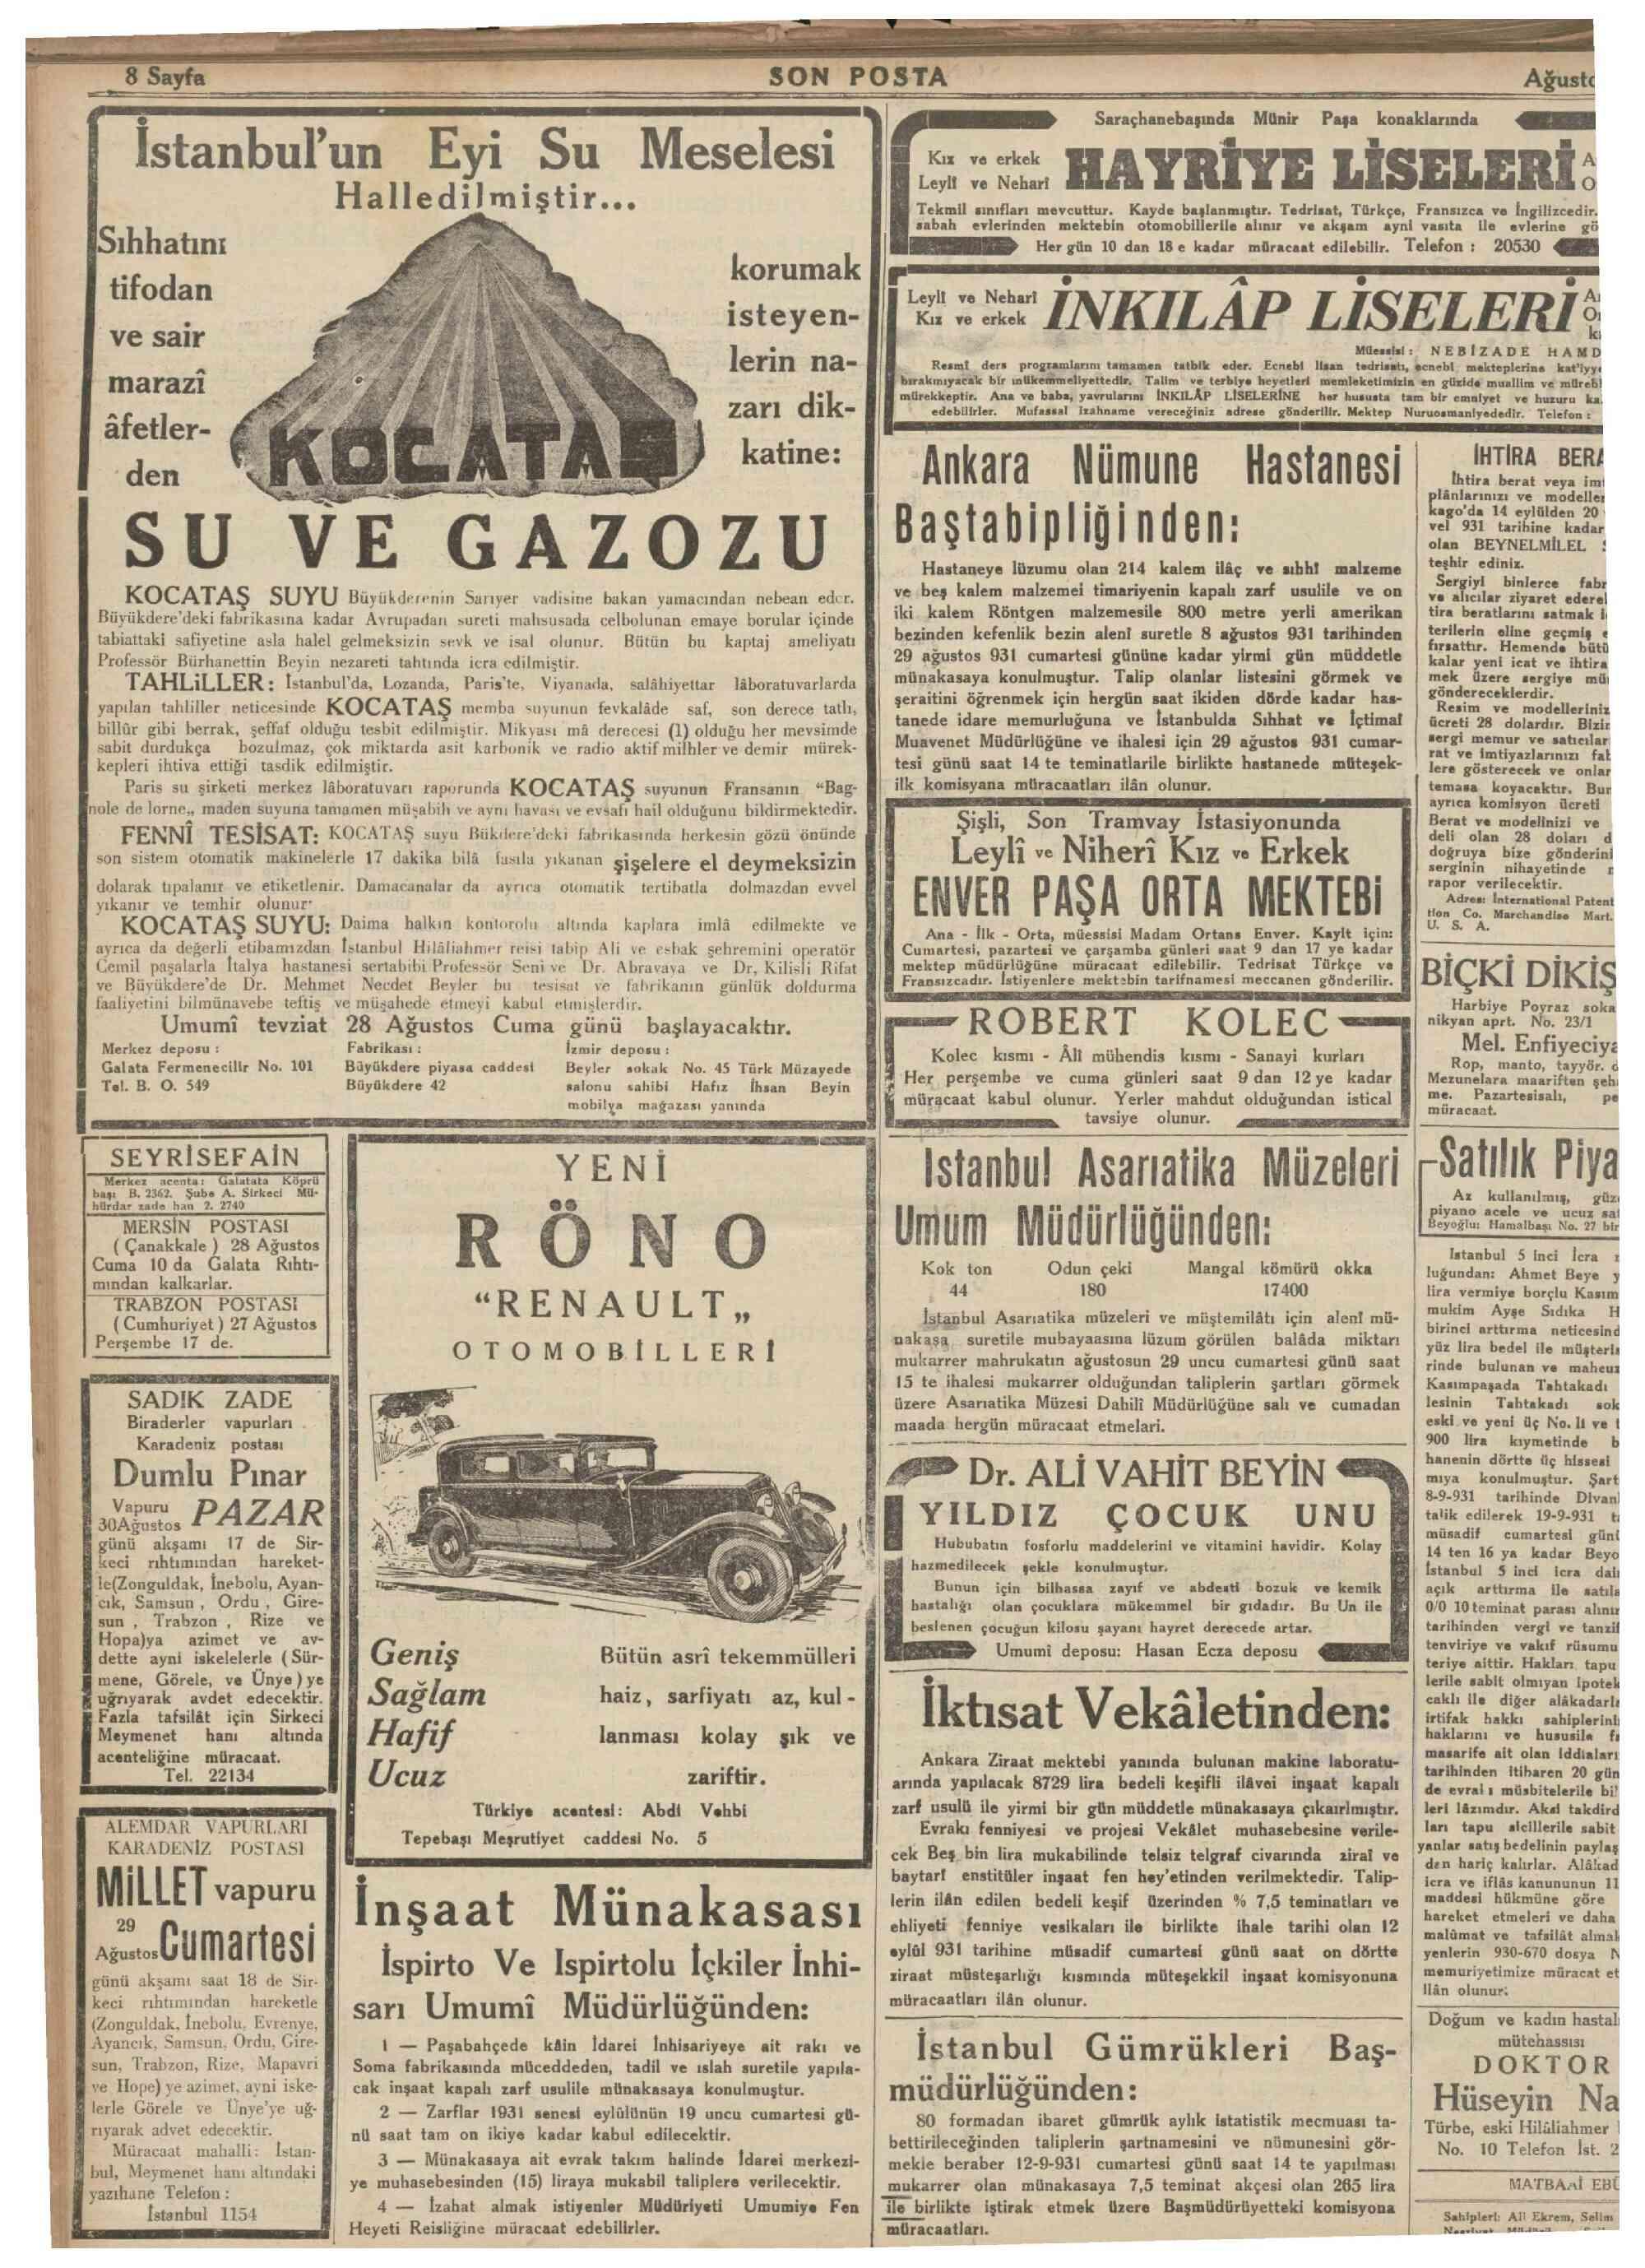 28 Ağustos 1931 Tarihli Son Posta Dergisi Sayfa 8